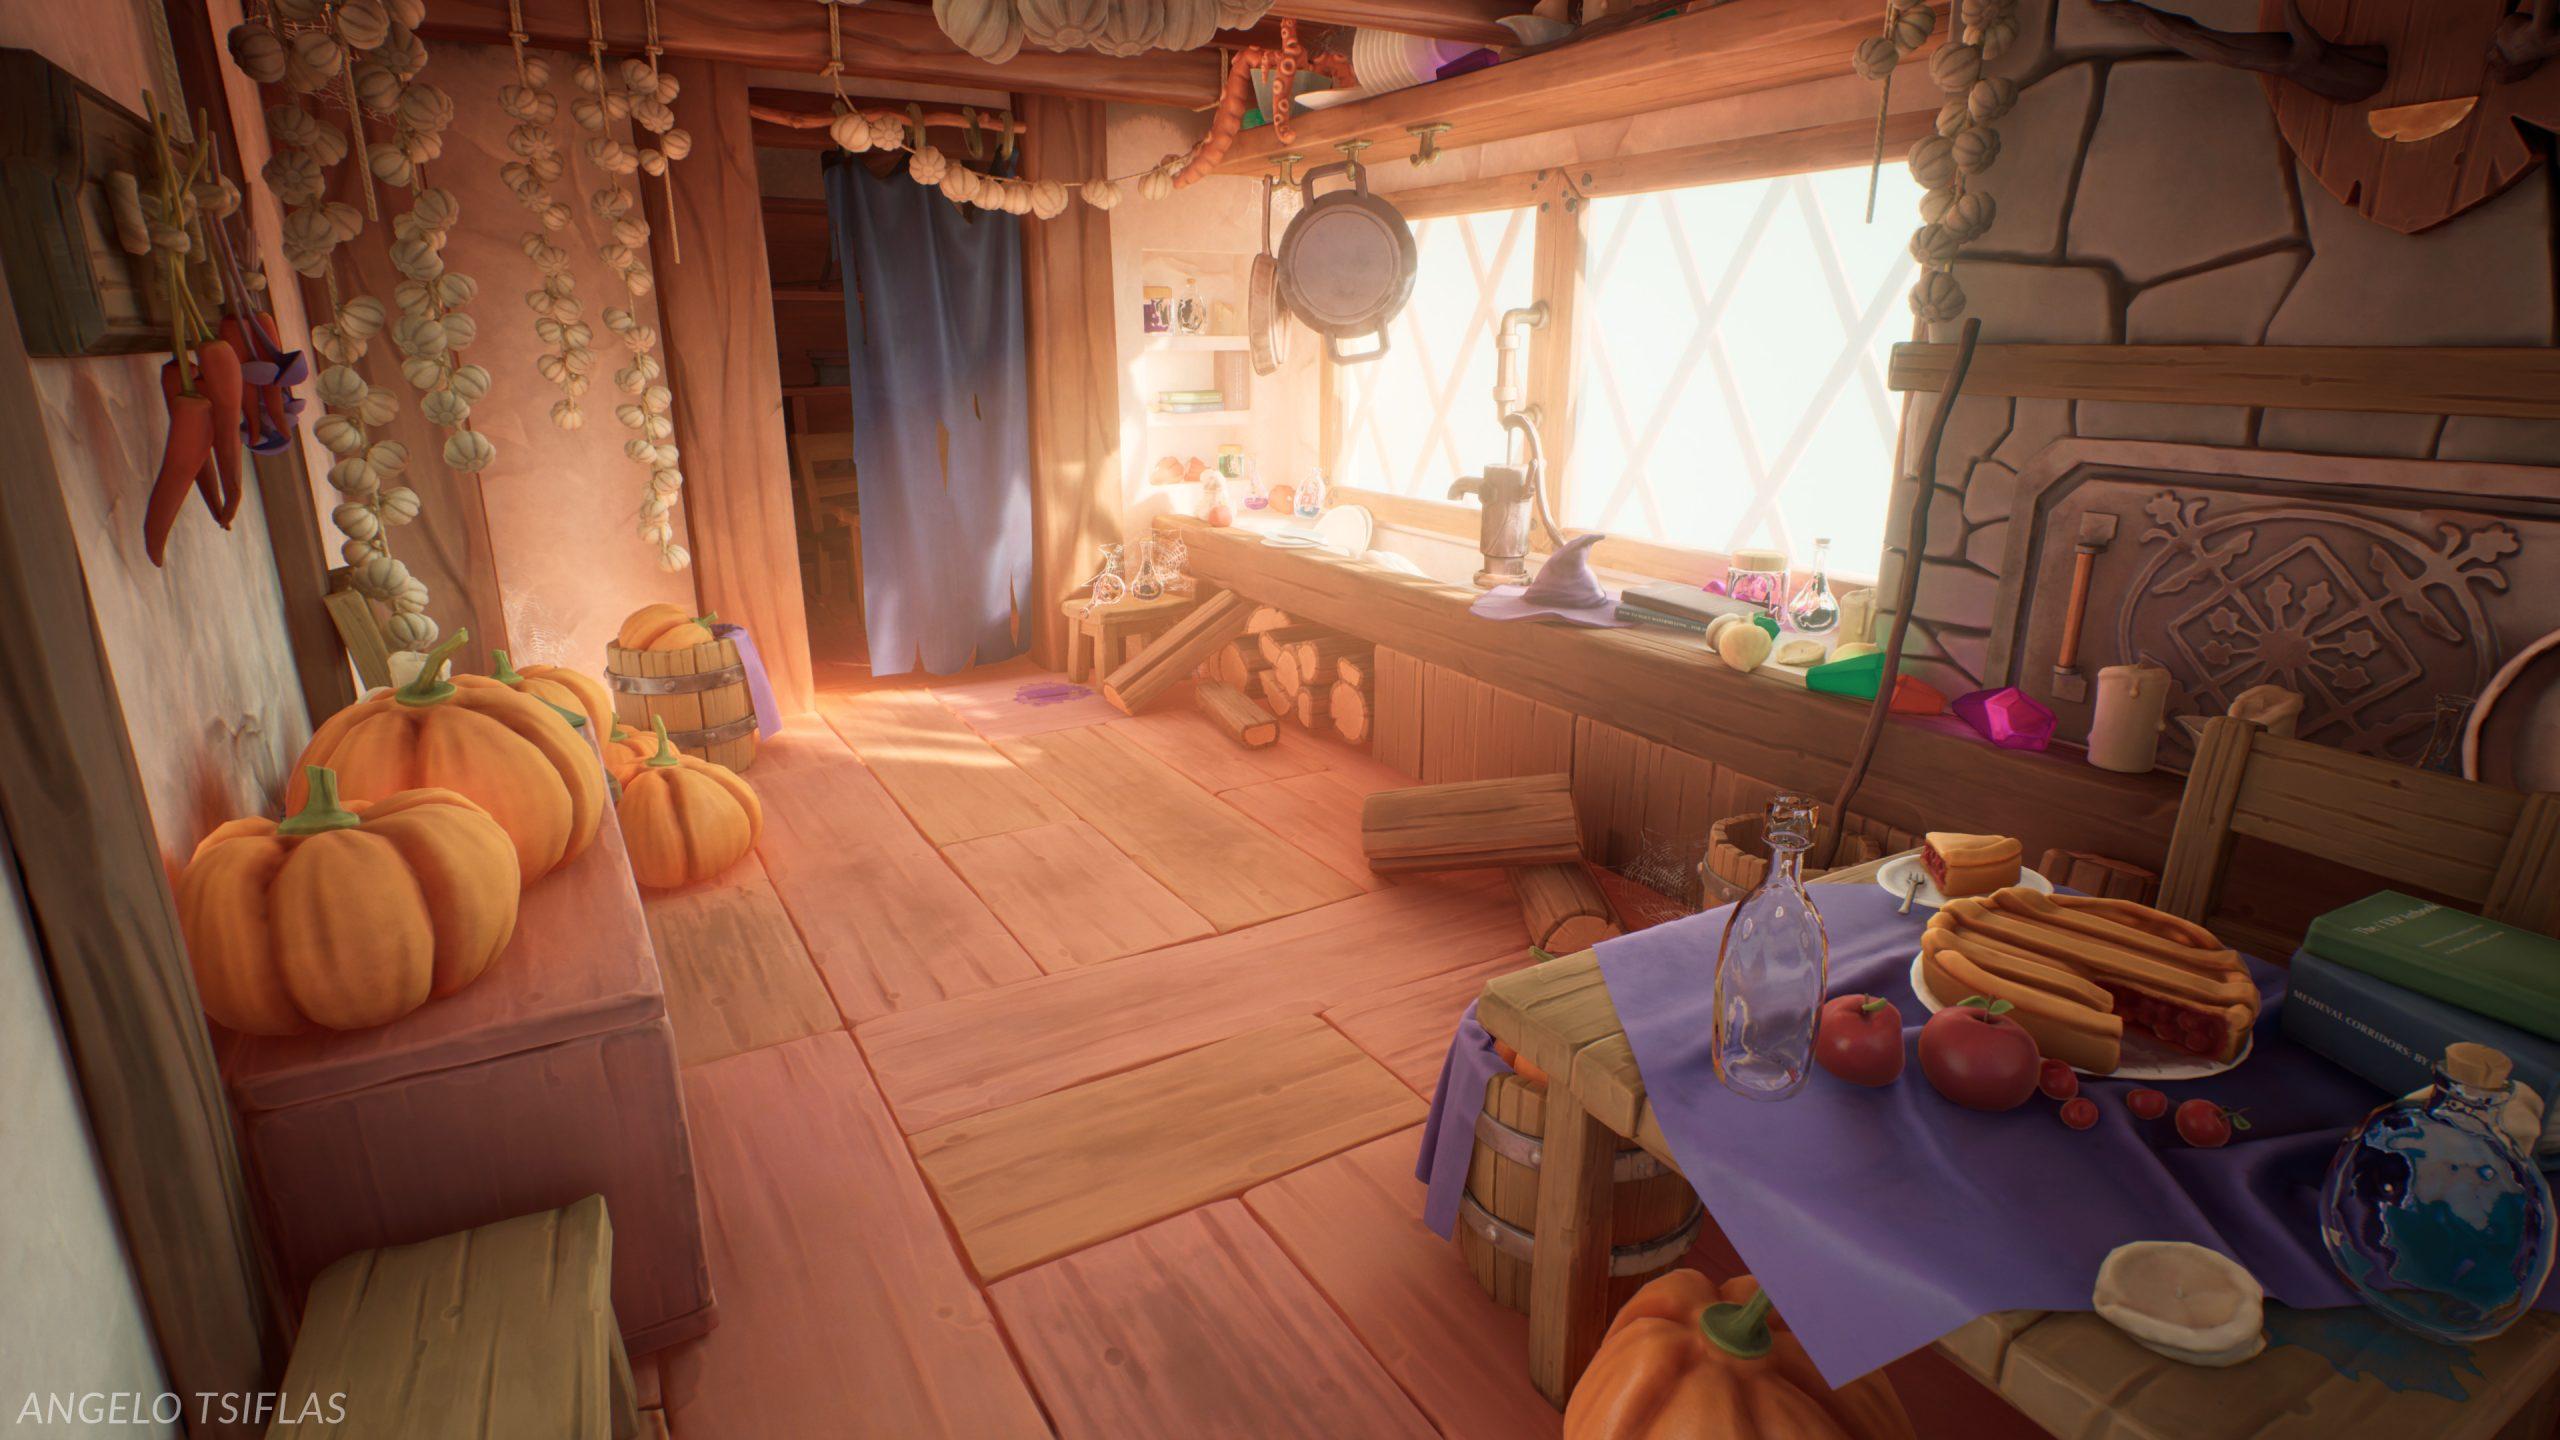 Agancg_UE4_Stylized-Witch-Hut-Interior01